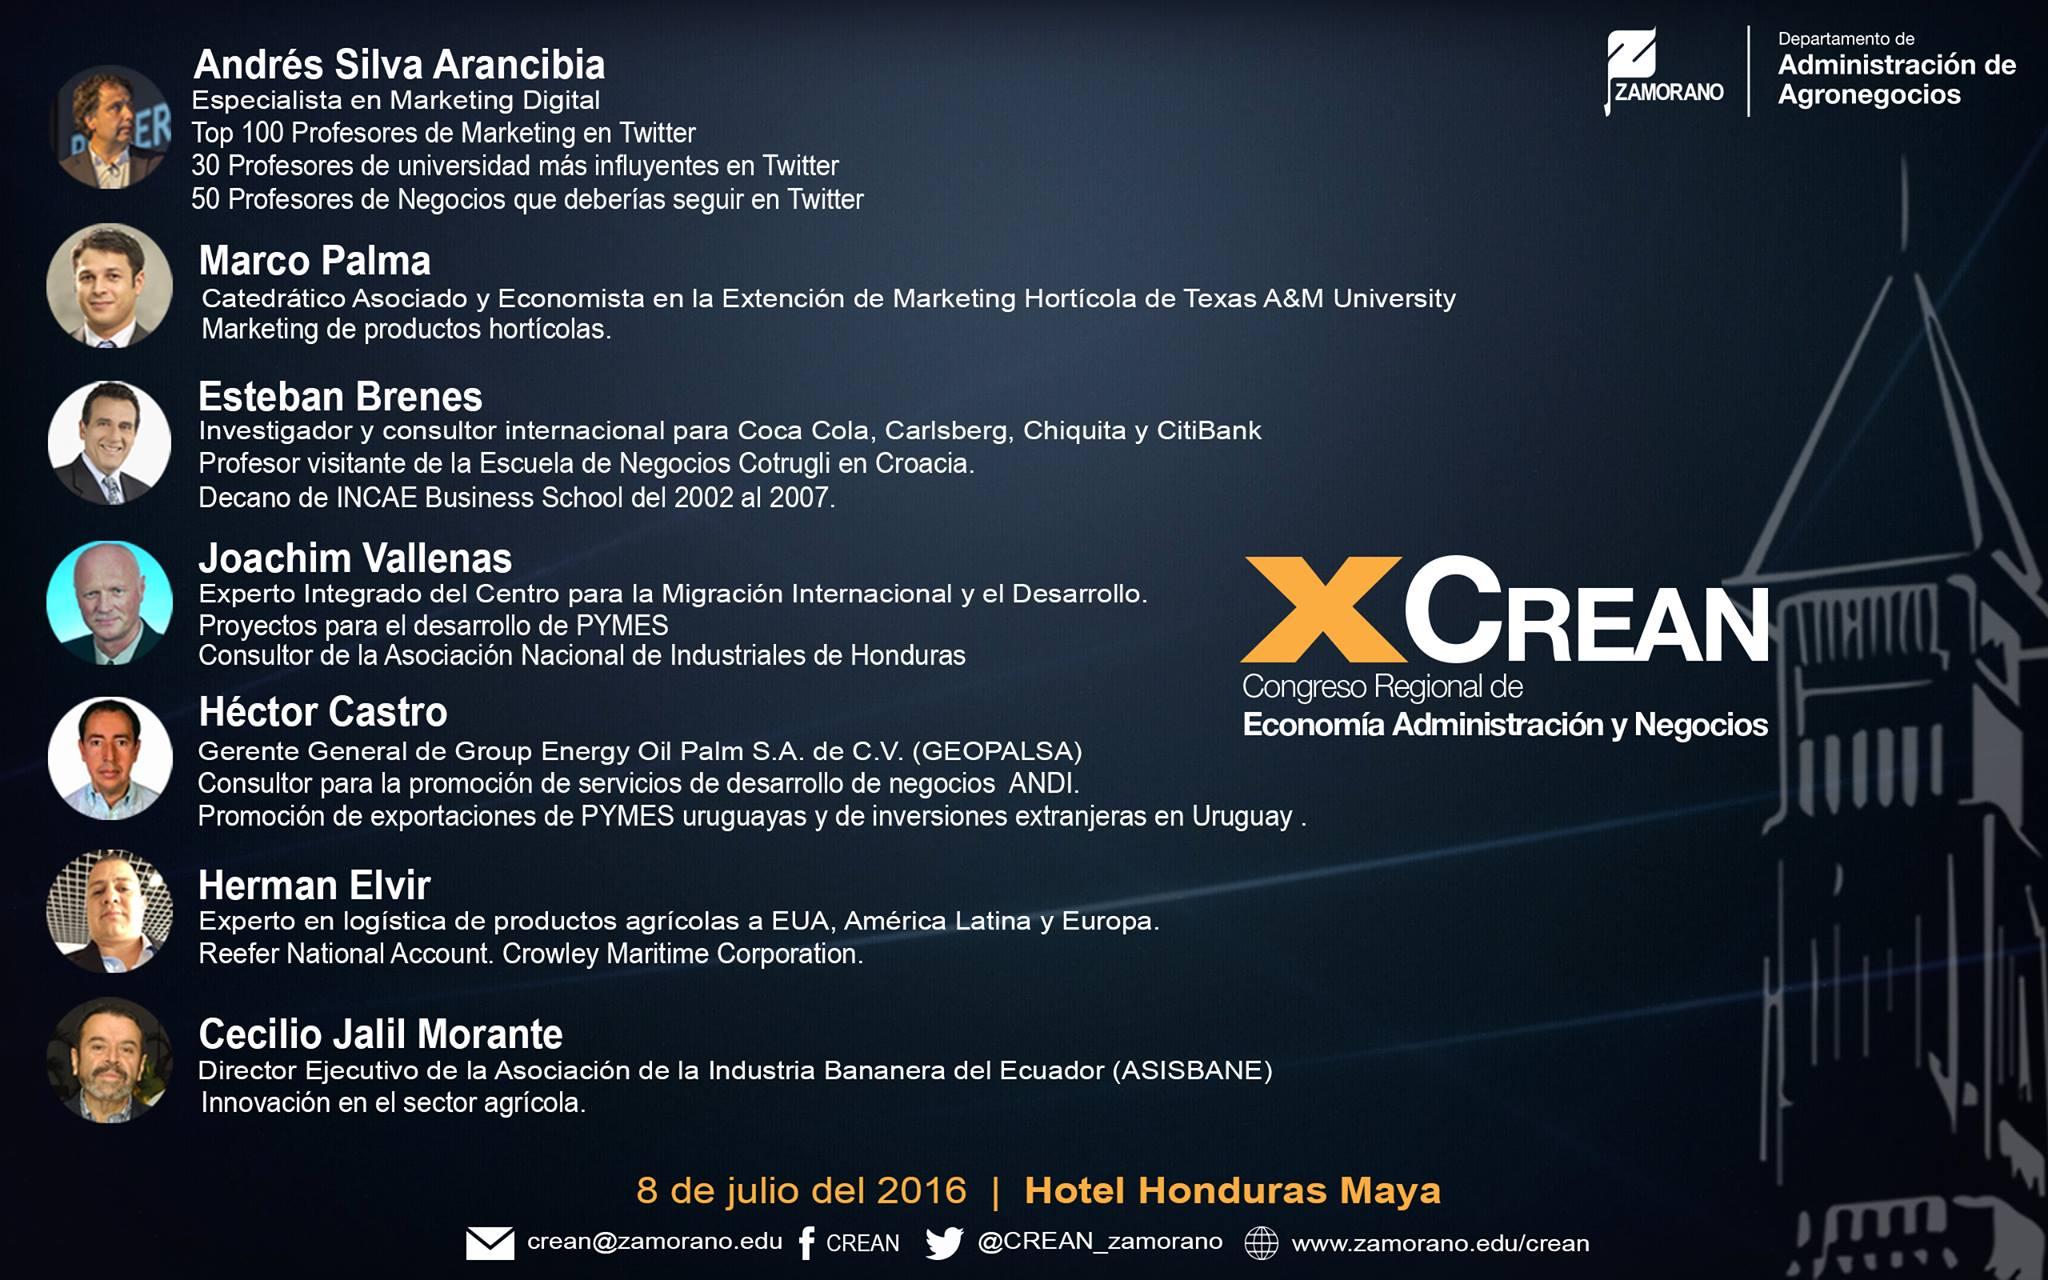 CREAN Tegucigalpa Honduras 2016 Andrés Silva Arancibia Speaker